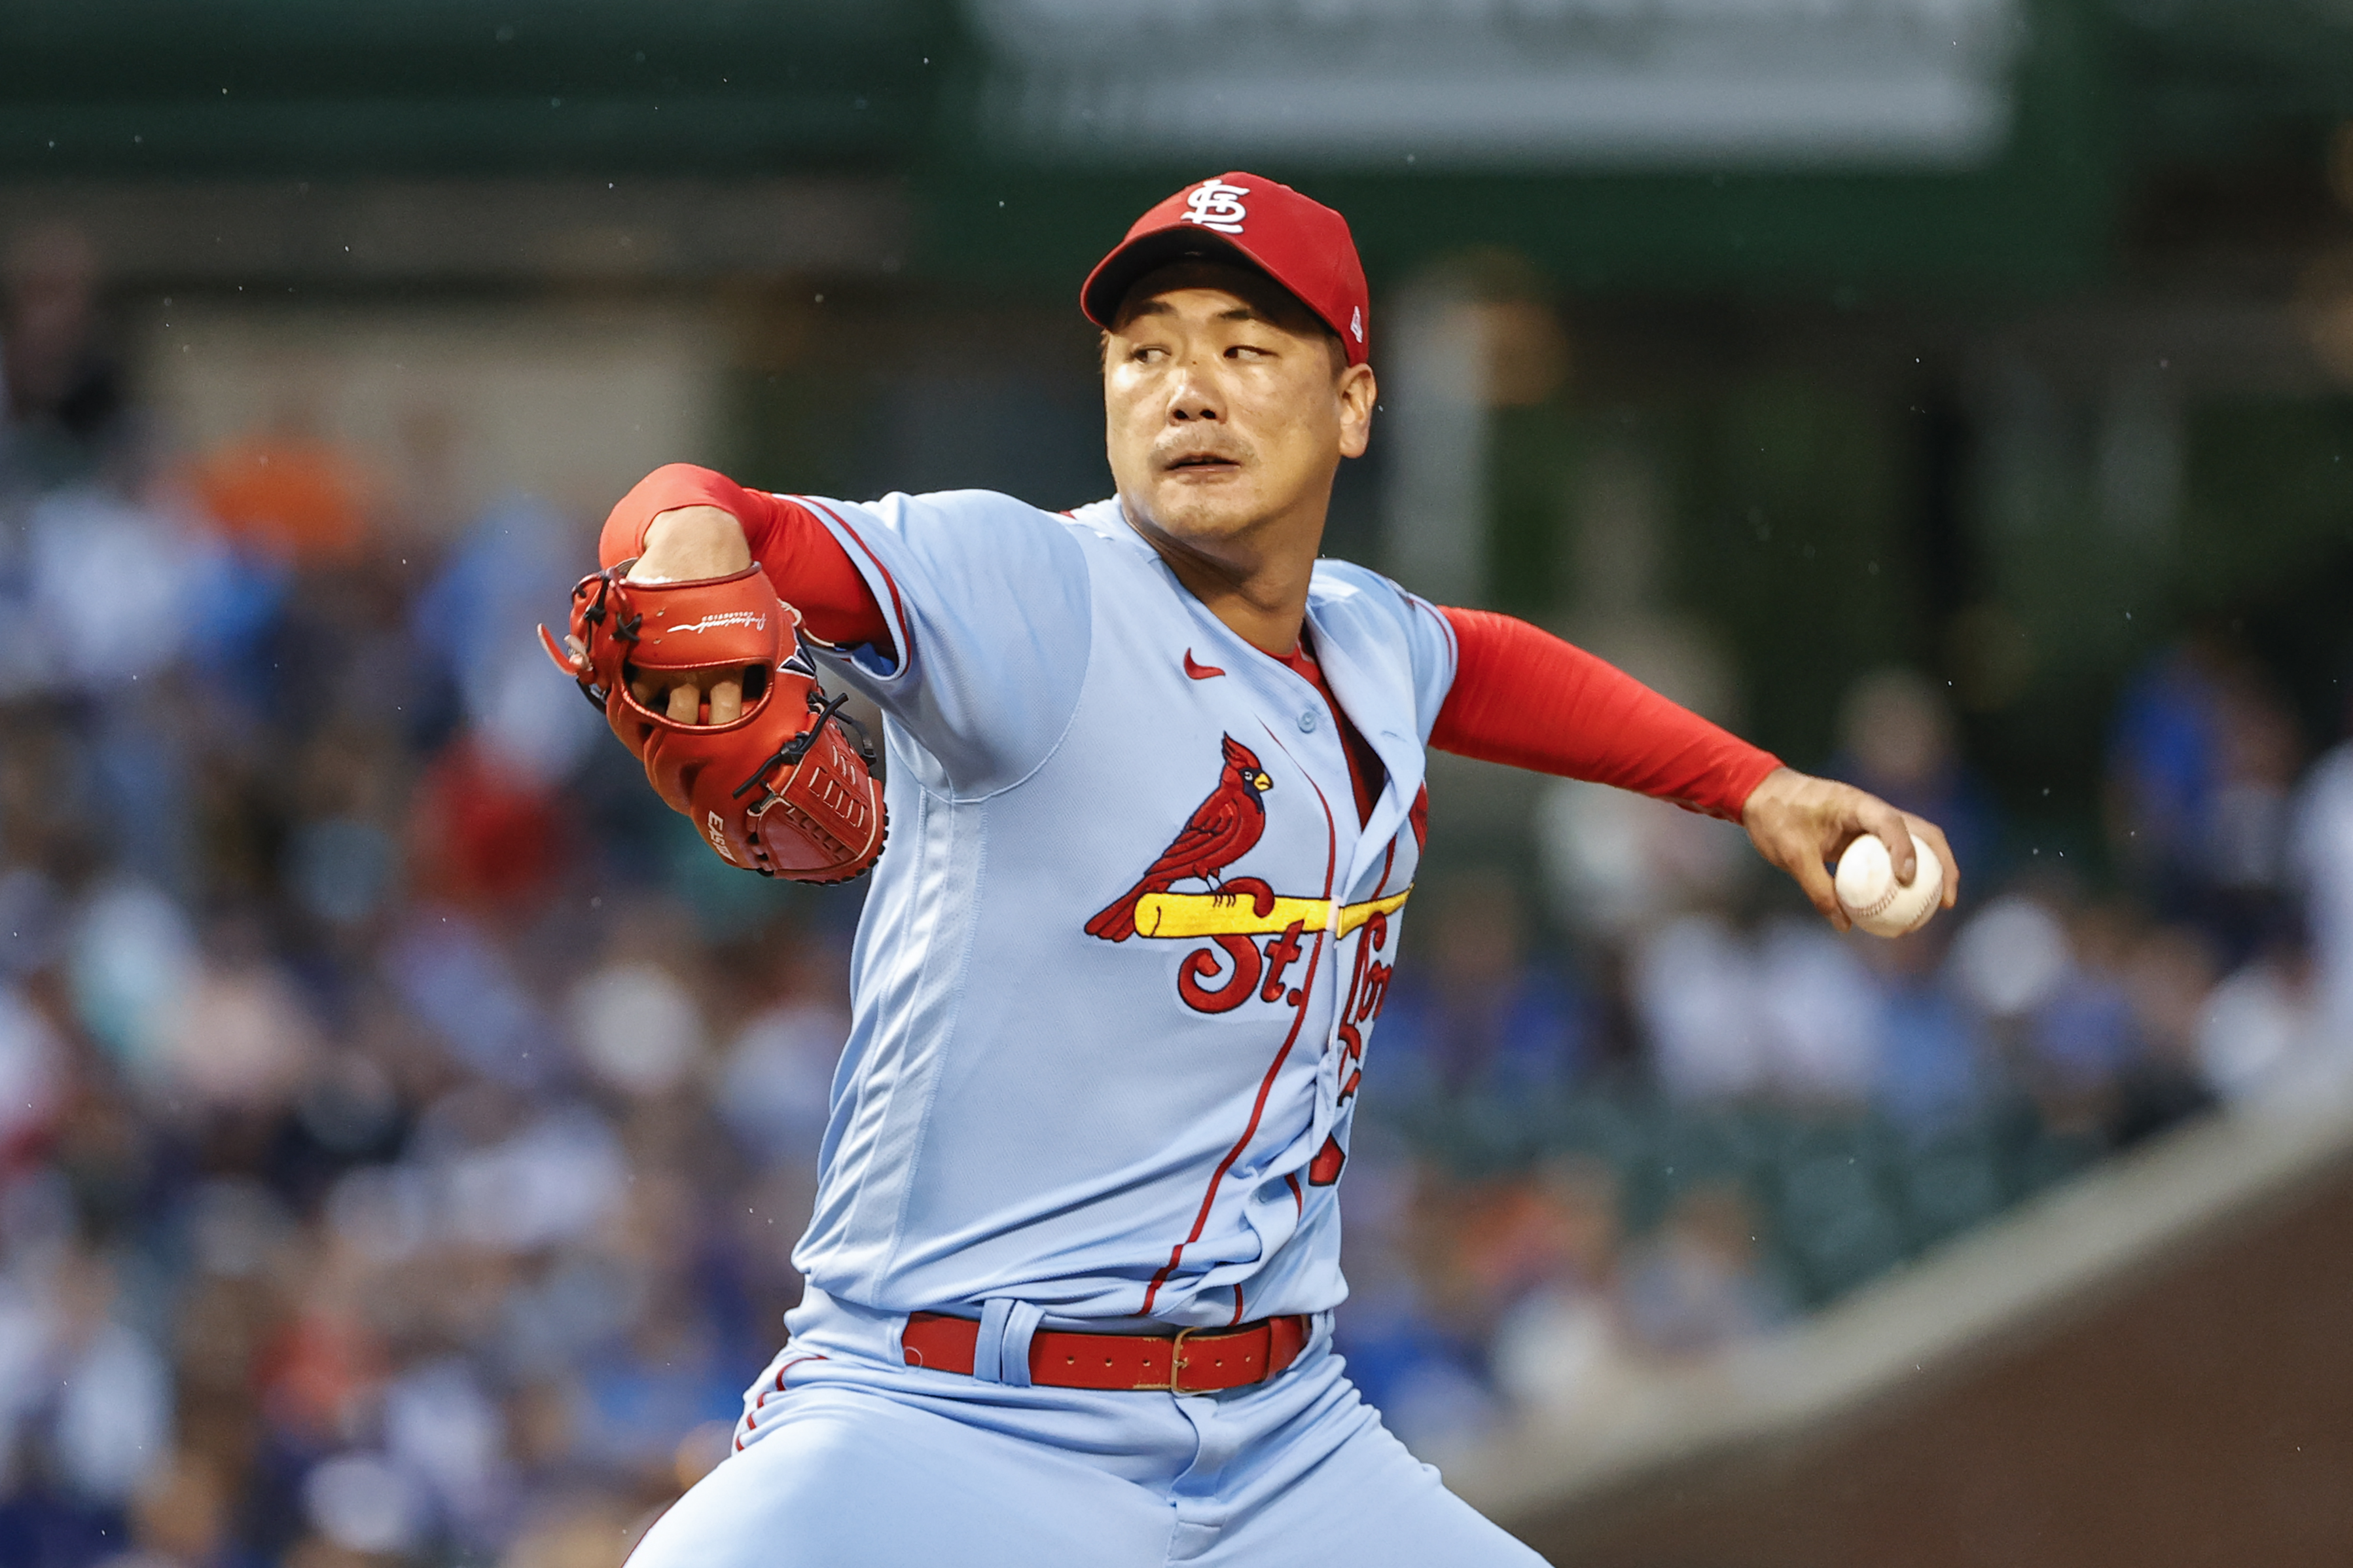 MLB:在芝加哥幼崽的圣路易斯红雀队